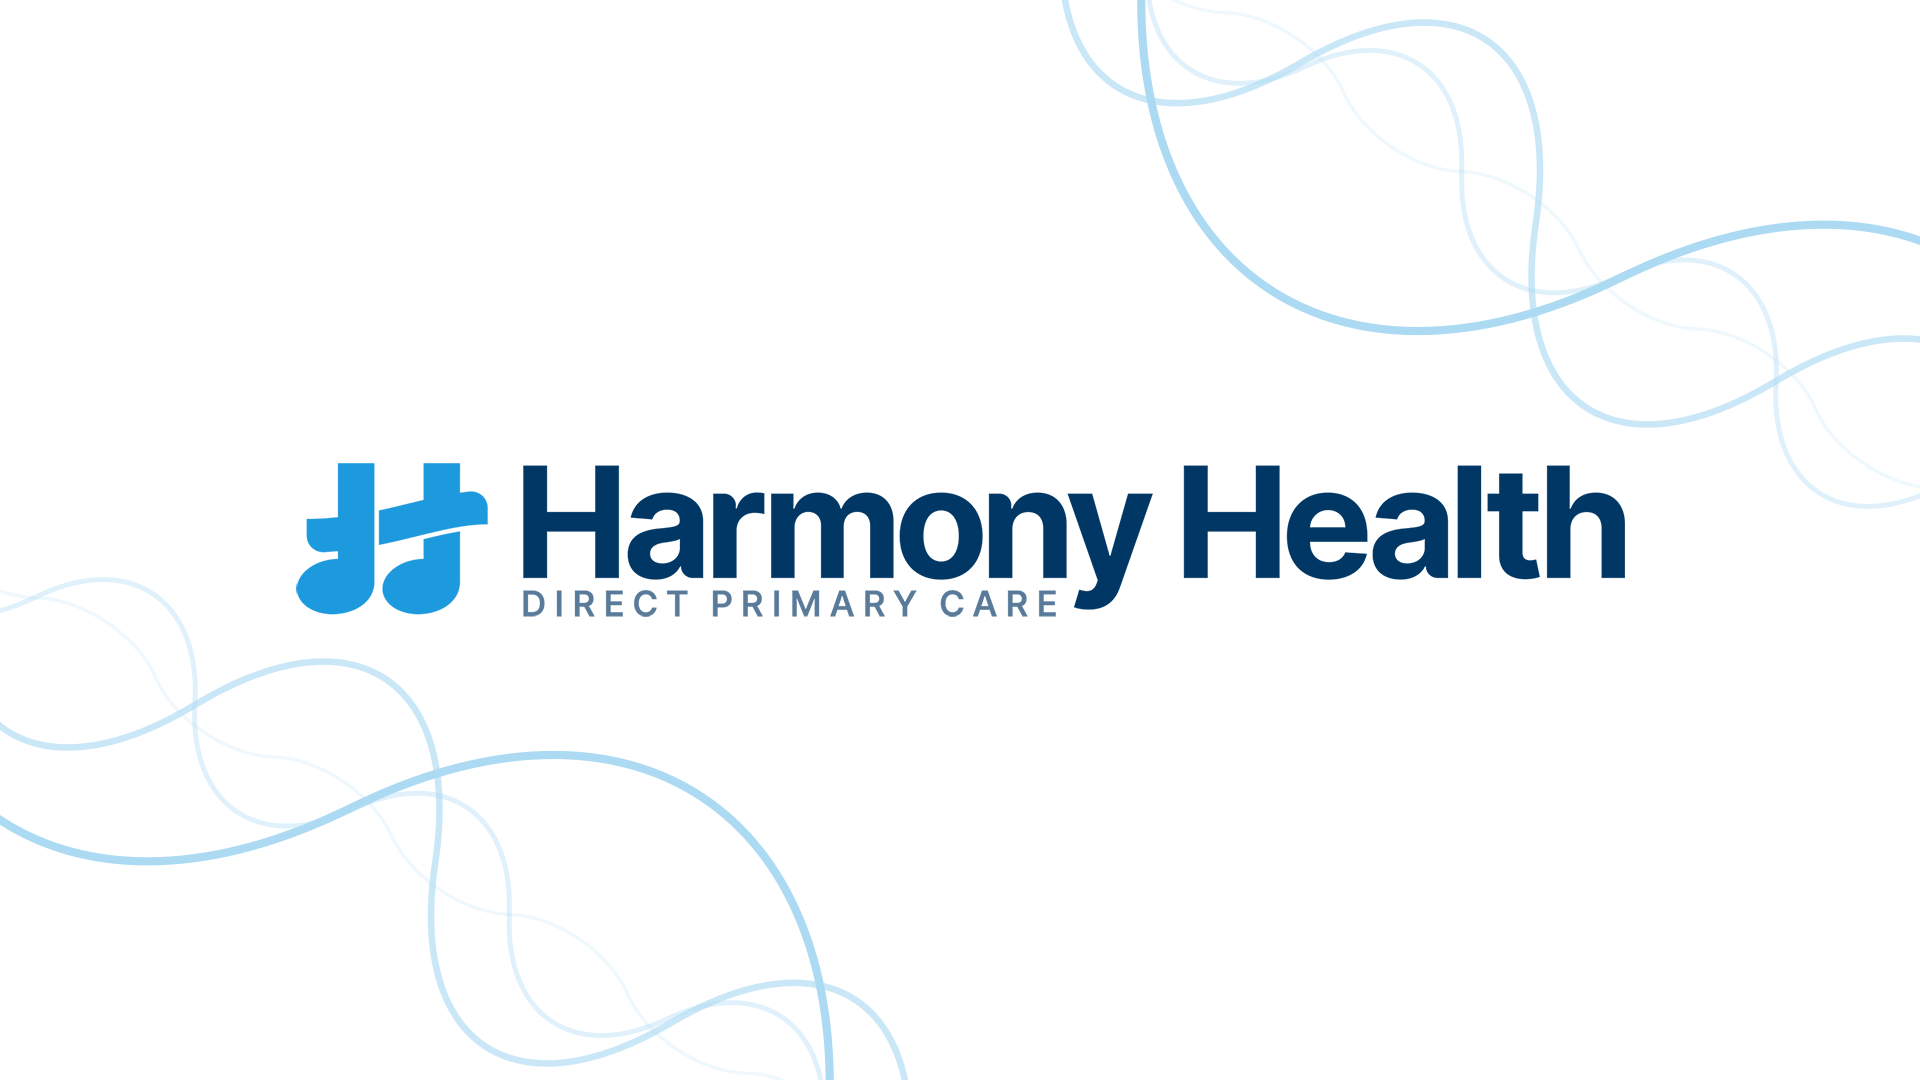 The Harmony Health logo on a white background.